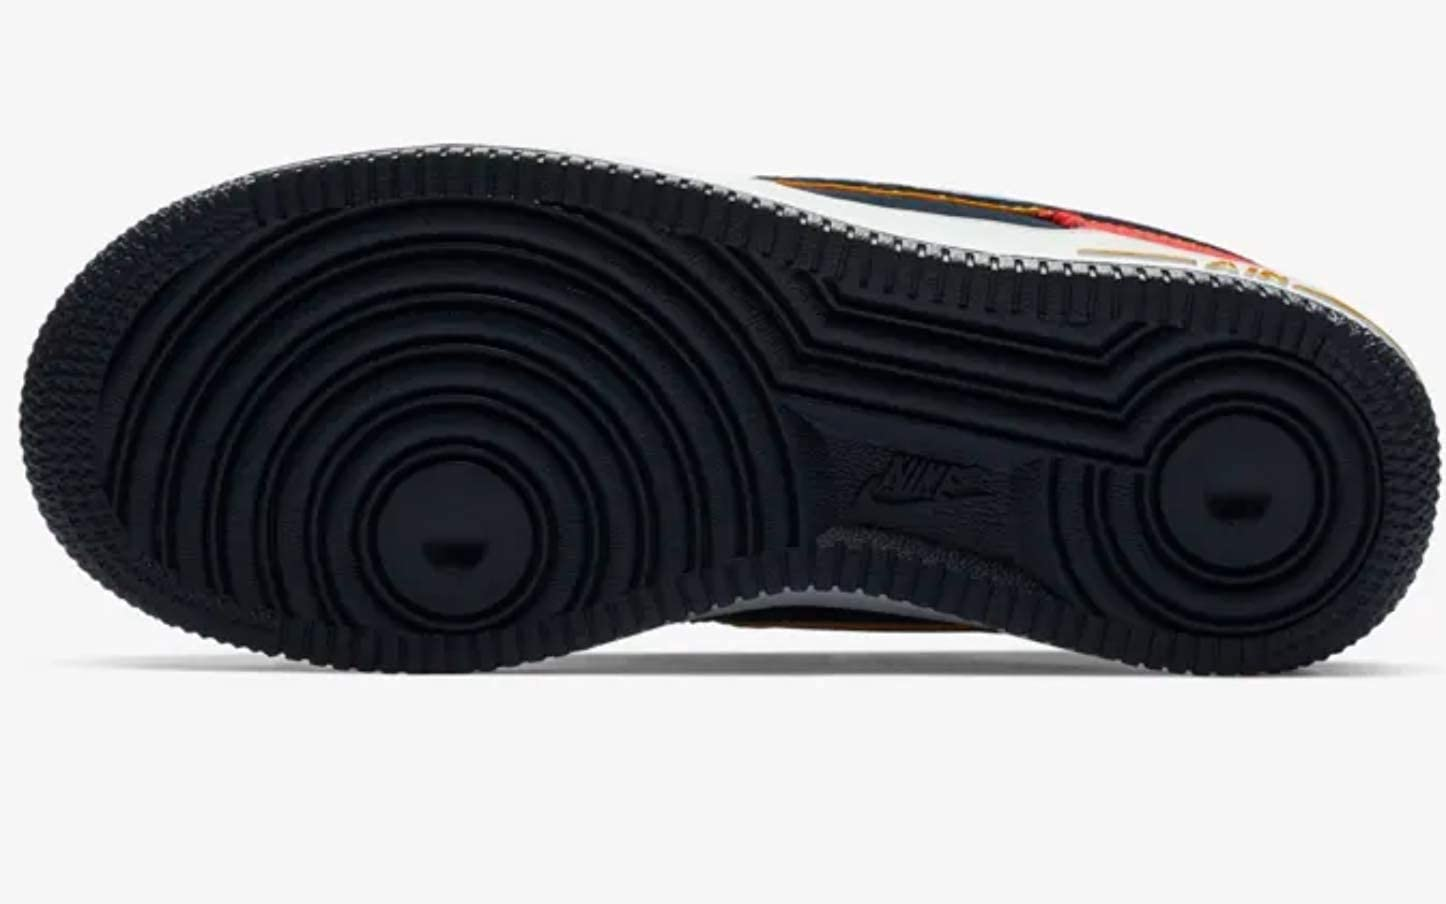 Nike Air Force 1 Now Kids Big Kids Av0748-400 Size 6.5